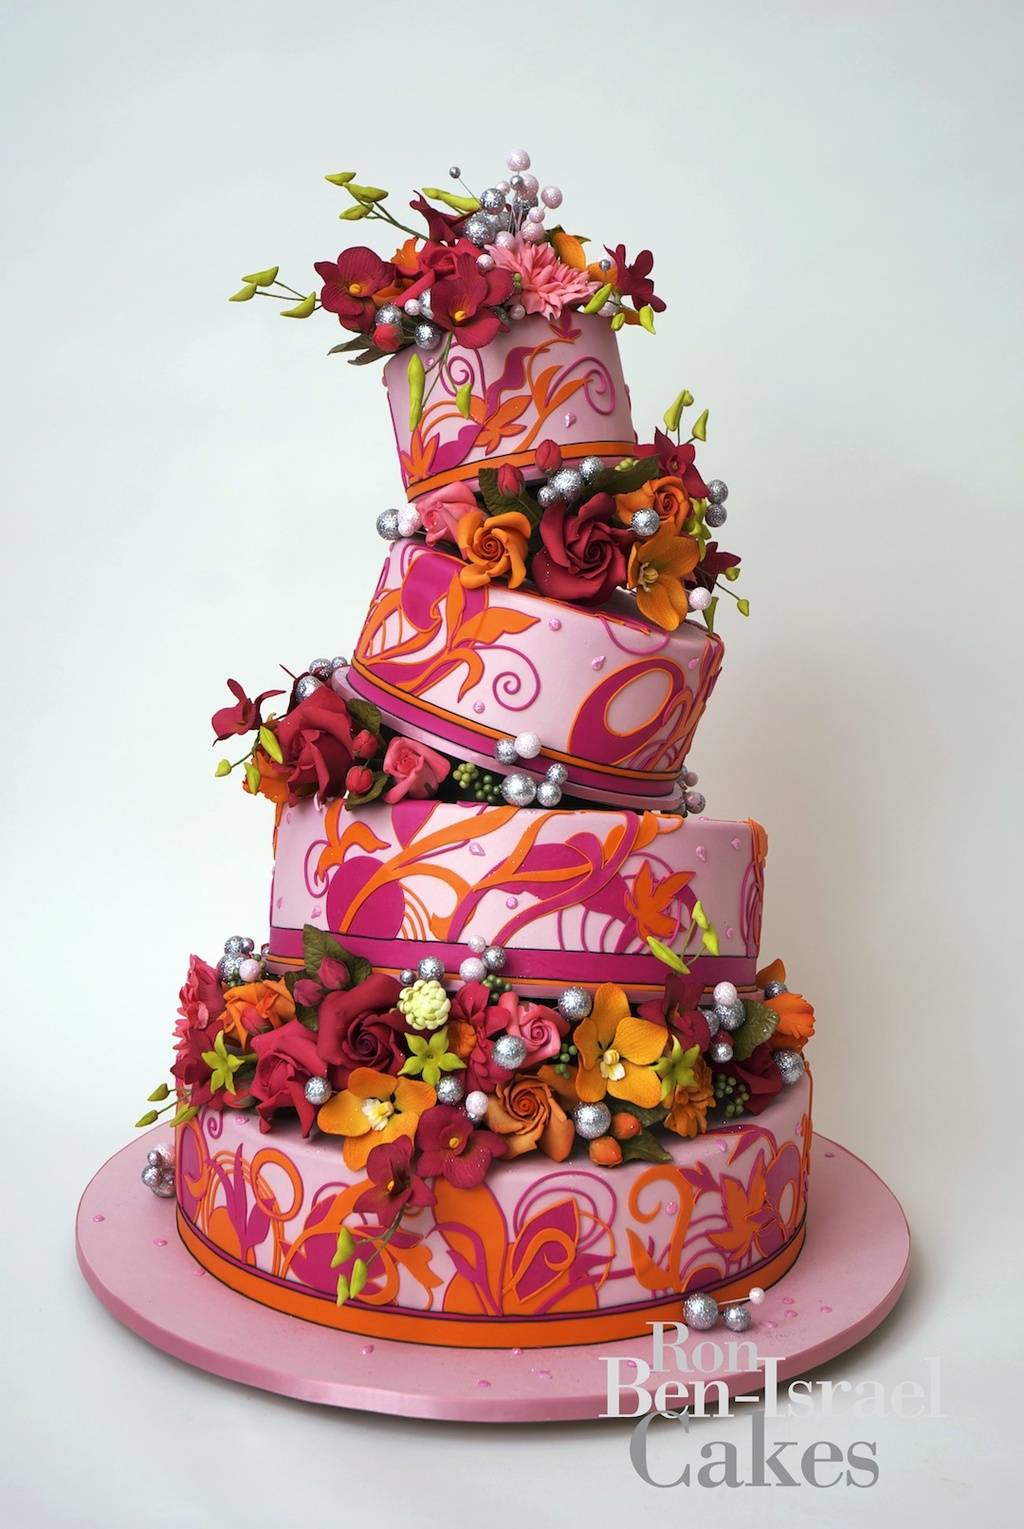 Wedding-cake-inspiration-ron-ben-isreal-wedding-cakes-pink-orange-funky-floral.full